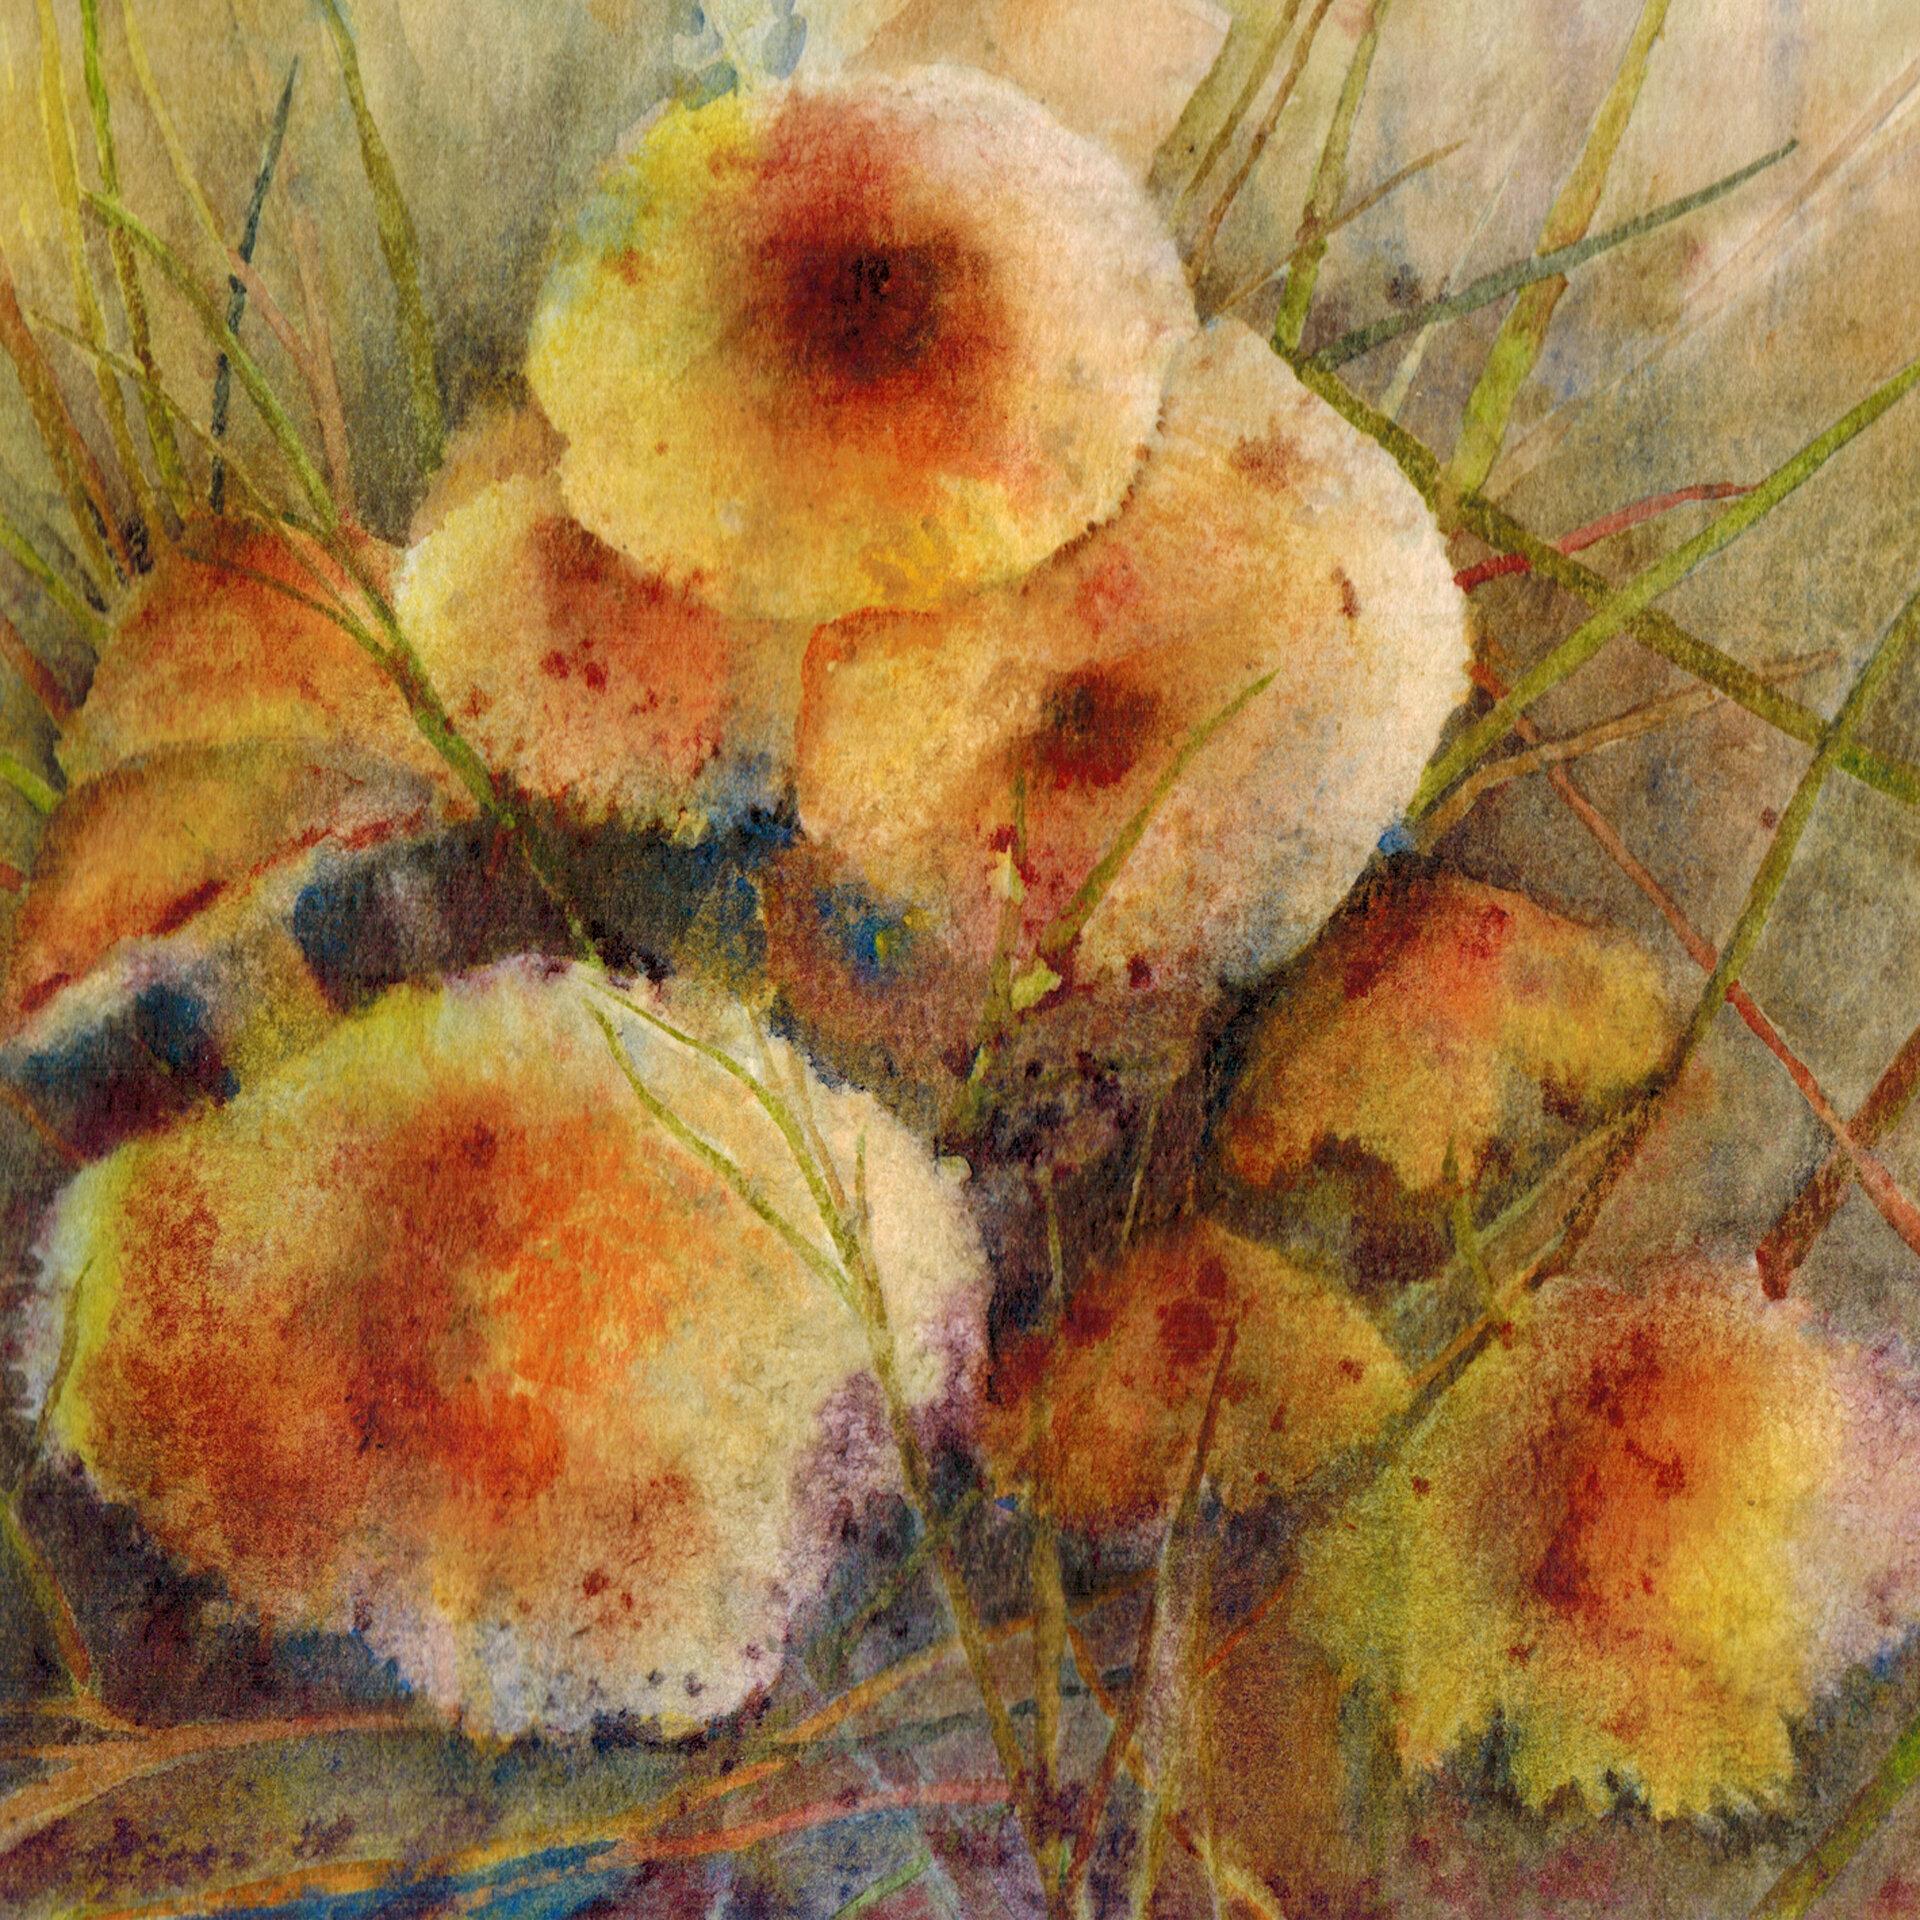 Pinson Jean Ann - Golden Mushrooms